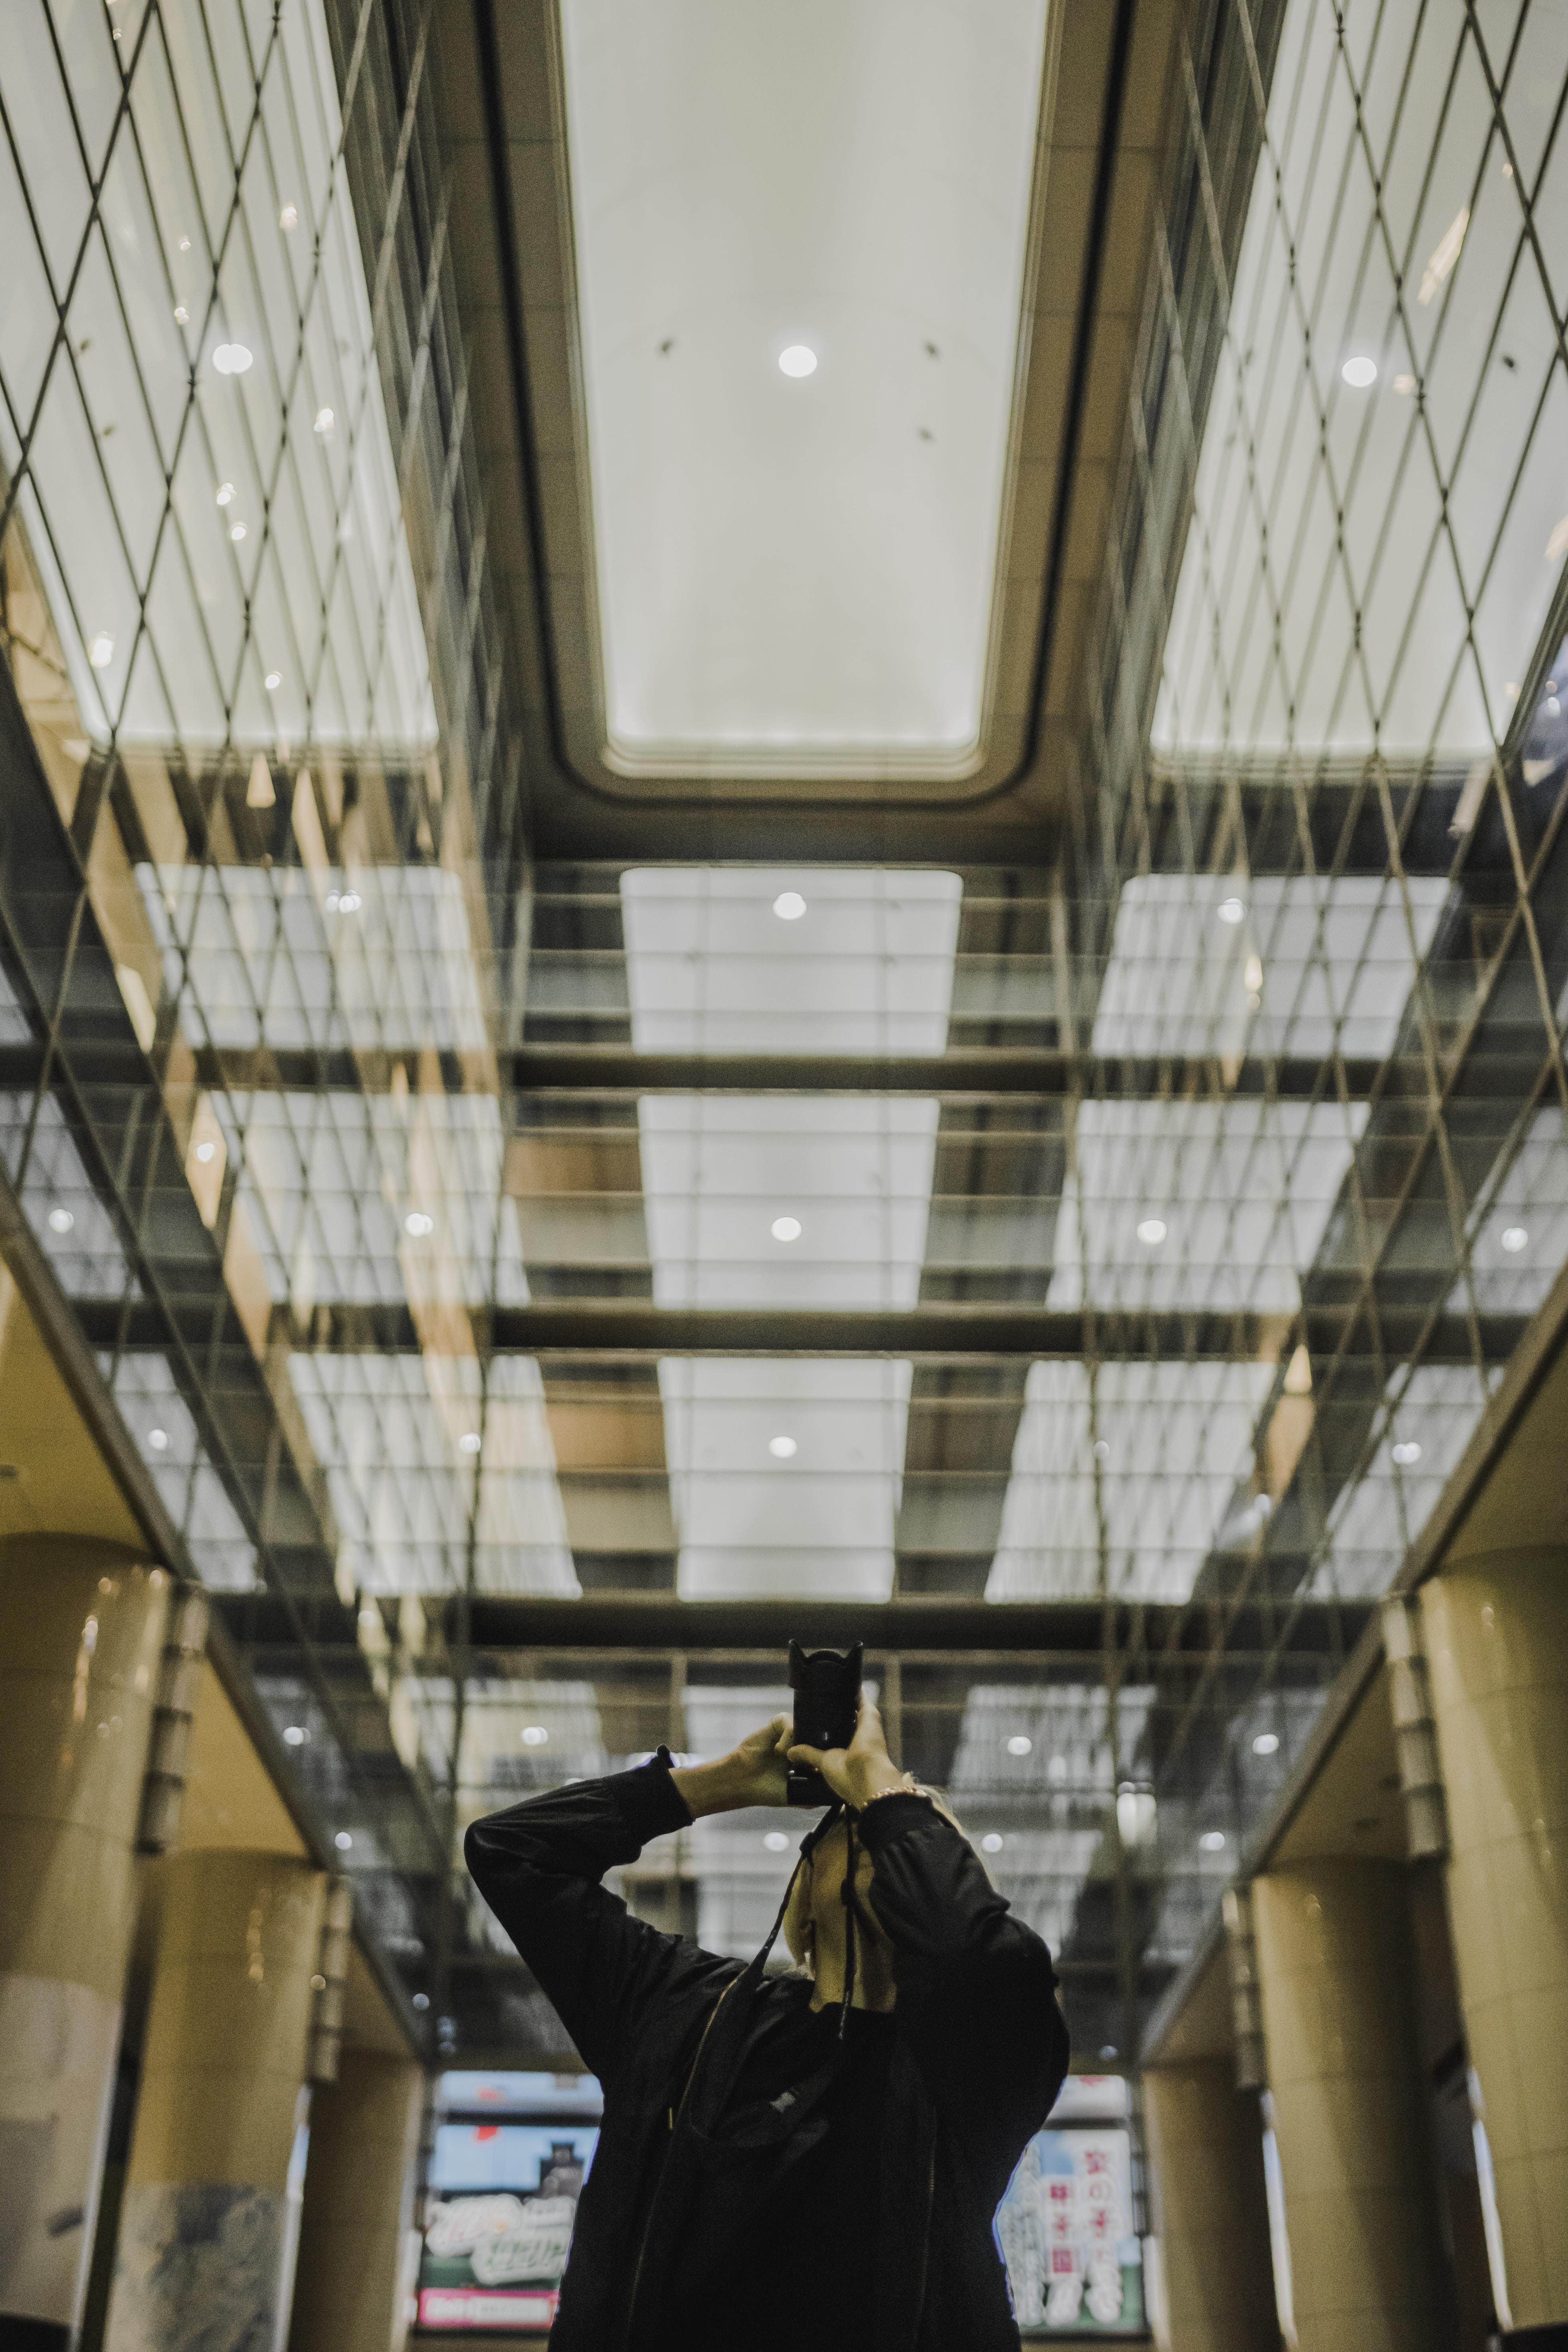 man holding DSLR camera while taking photo in hallway